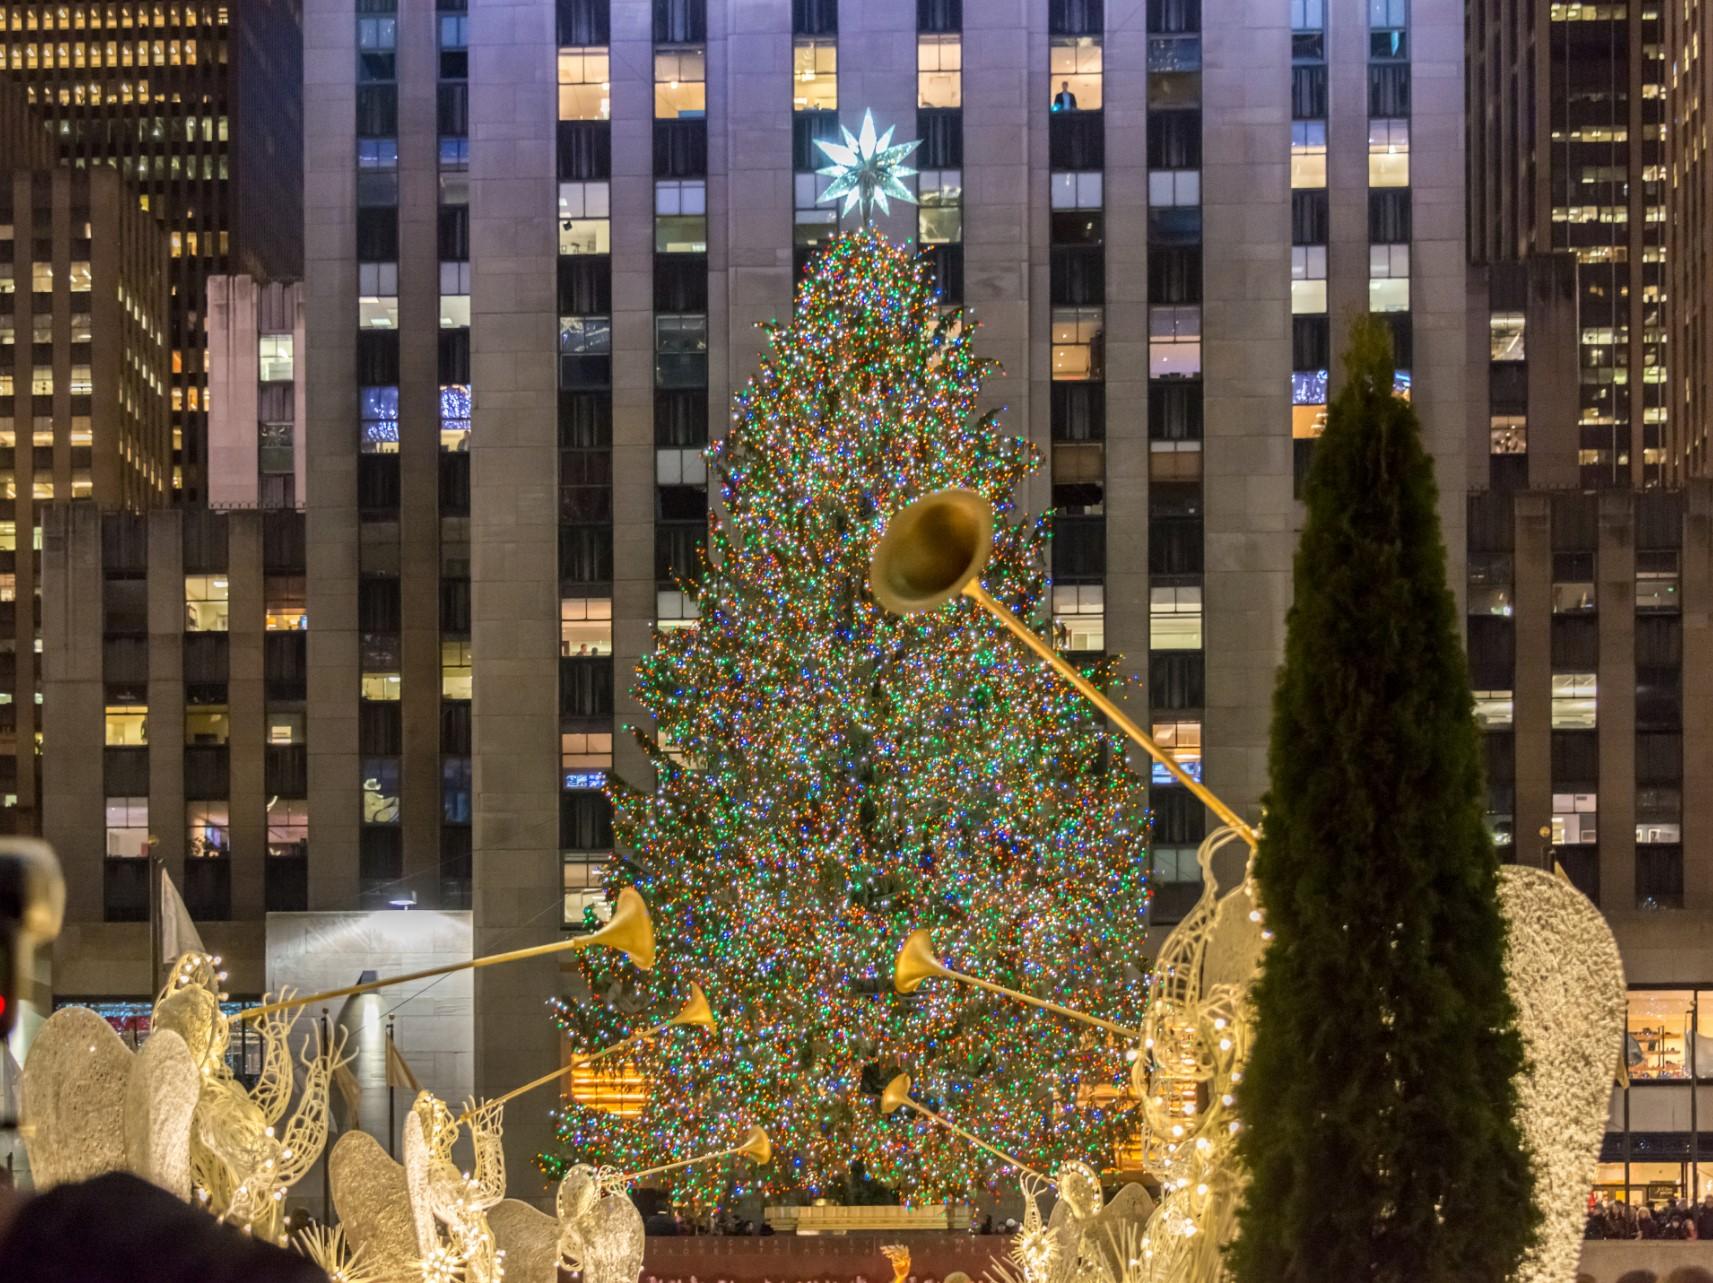 The famous rockefeller tree lit up fpr christmas - new york in december